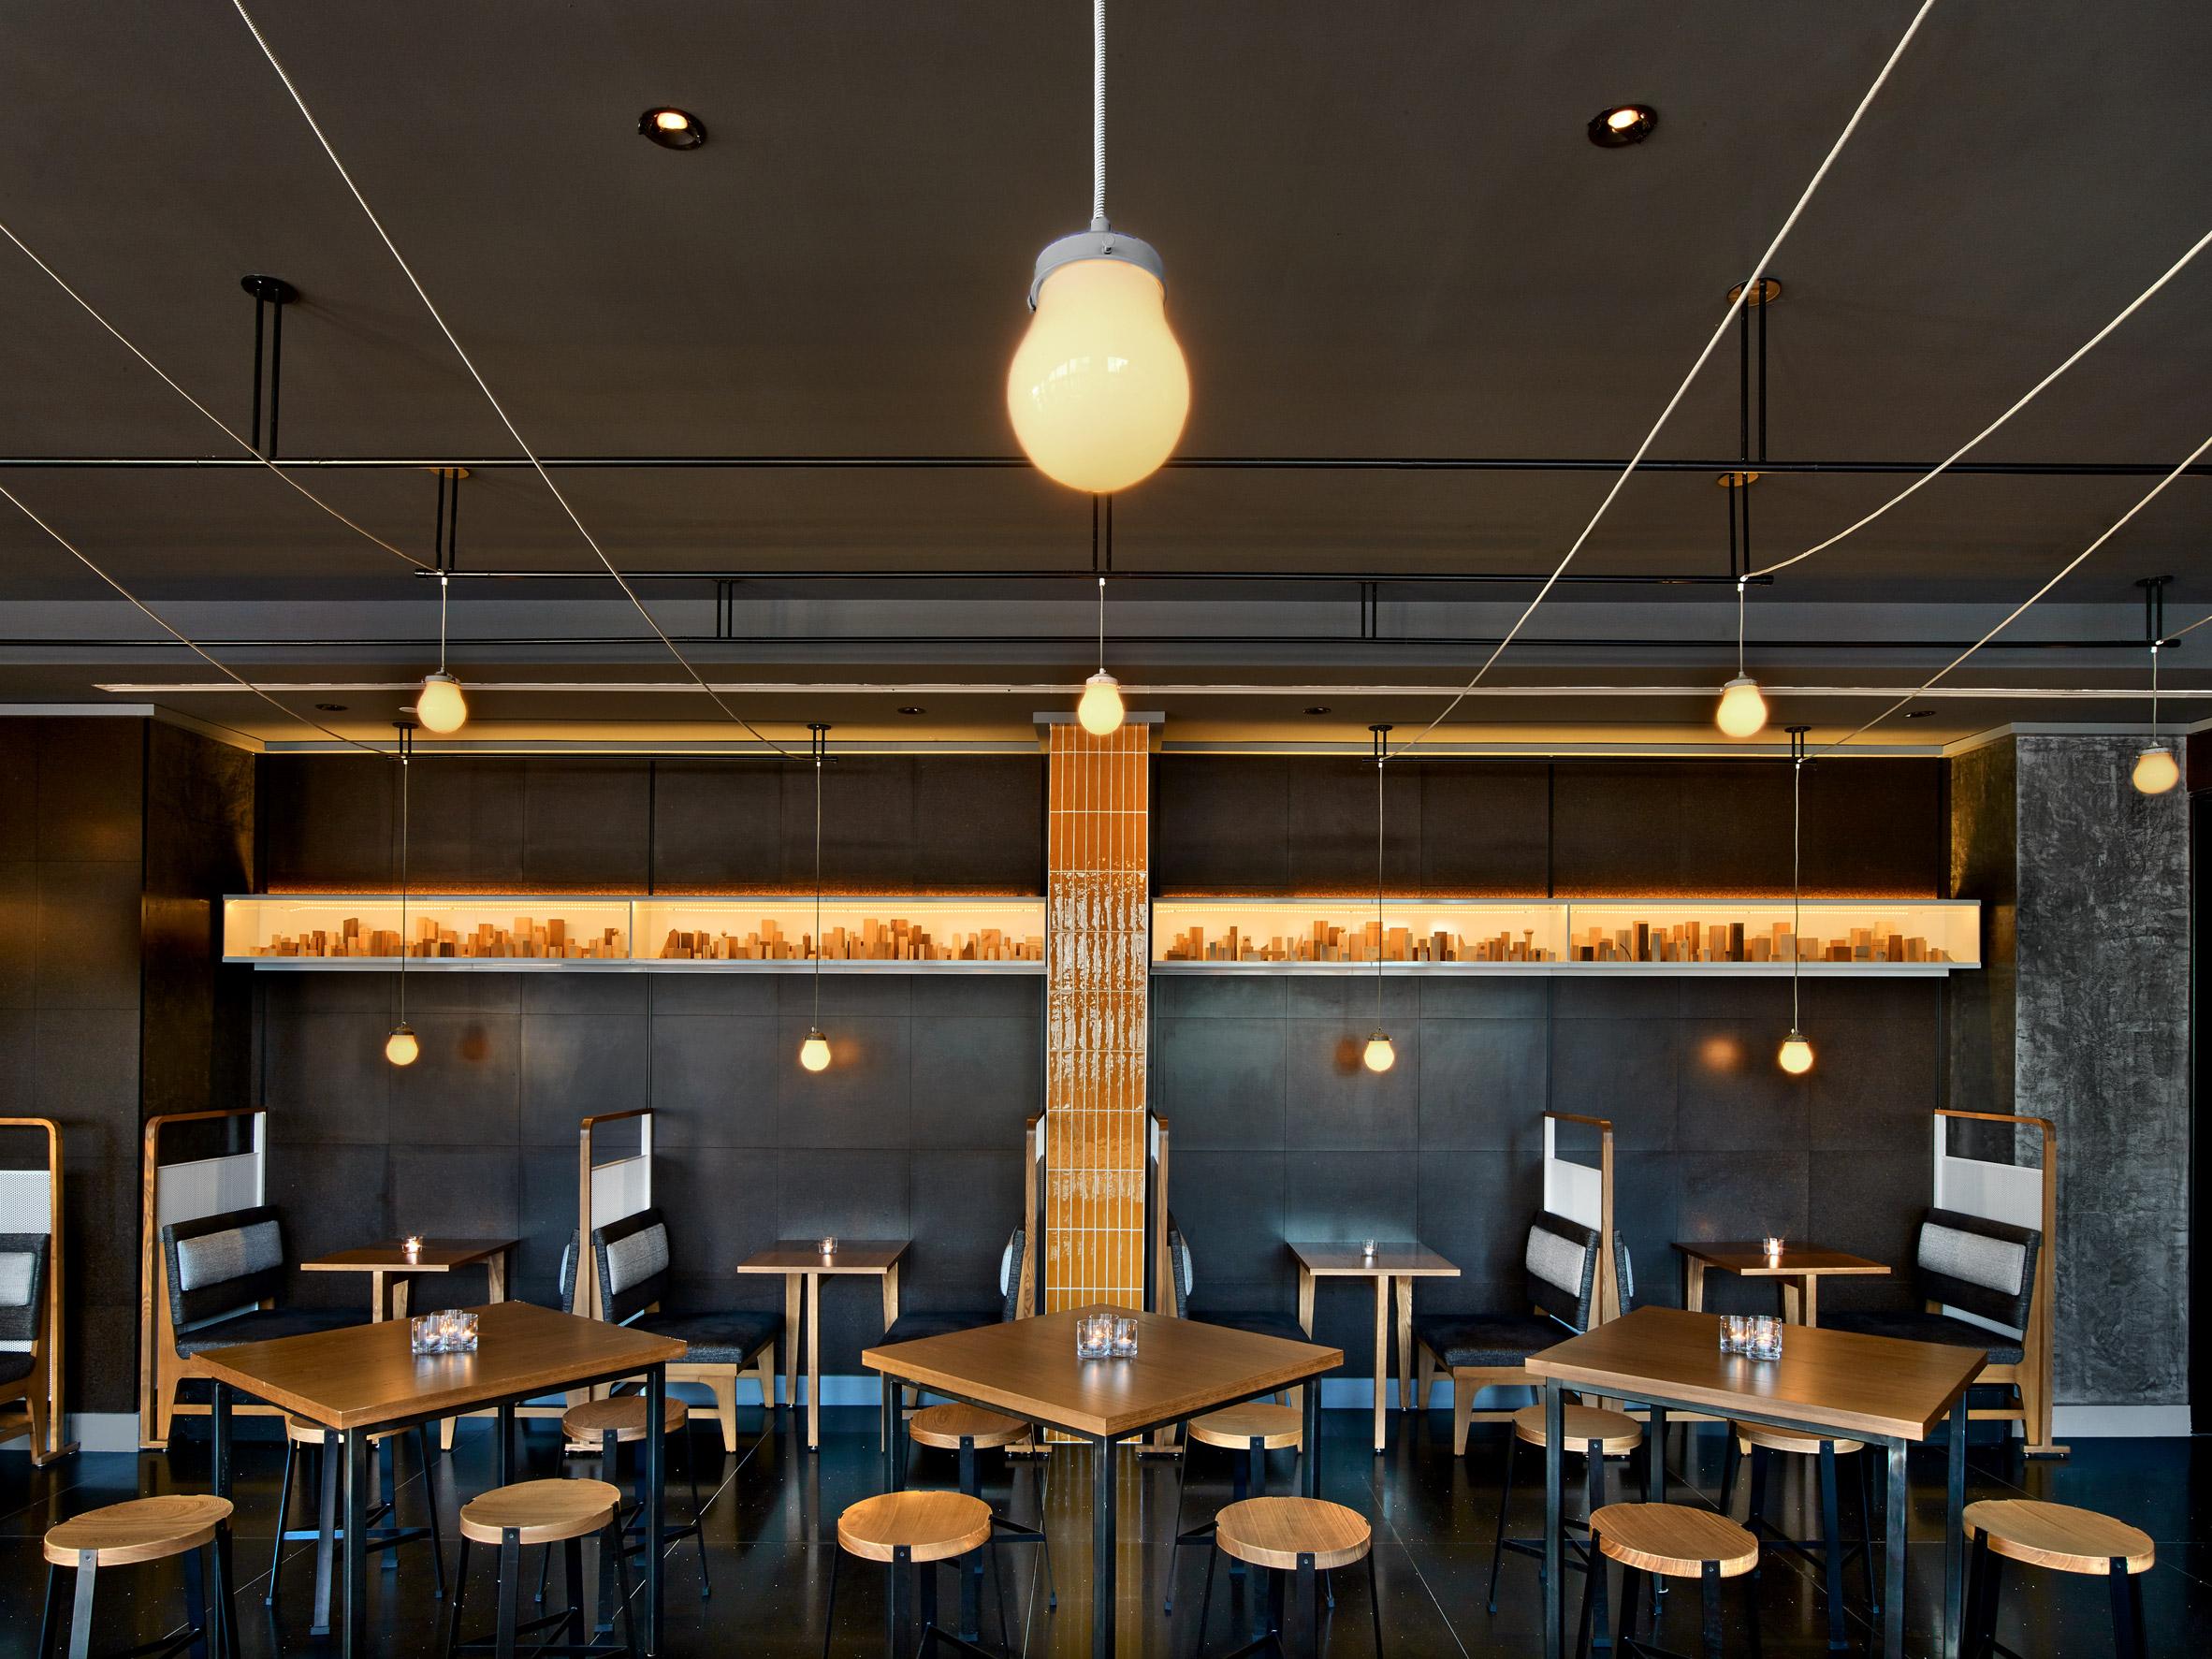 architecture-new-york-city-micro-hotel-design-studia-interiors-osnovadesign-osnova-poltava_12